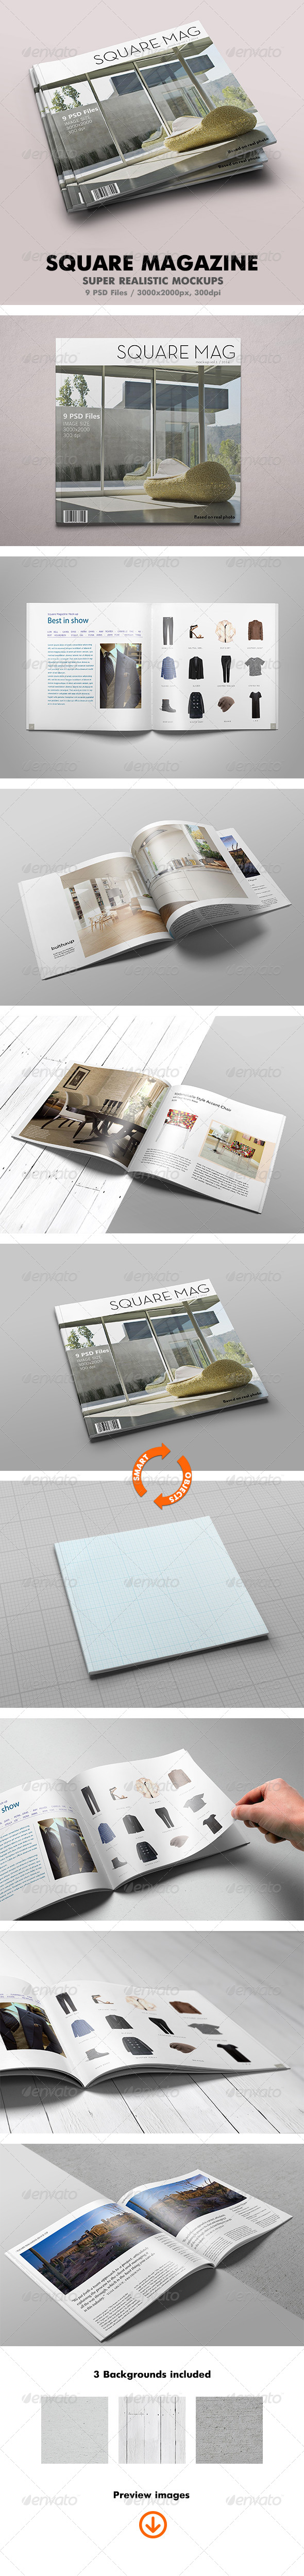 GraphicRiver Square Magazine Mock-Up 6835795